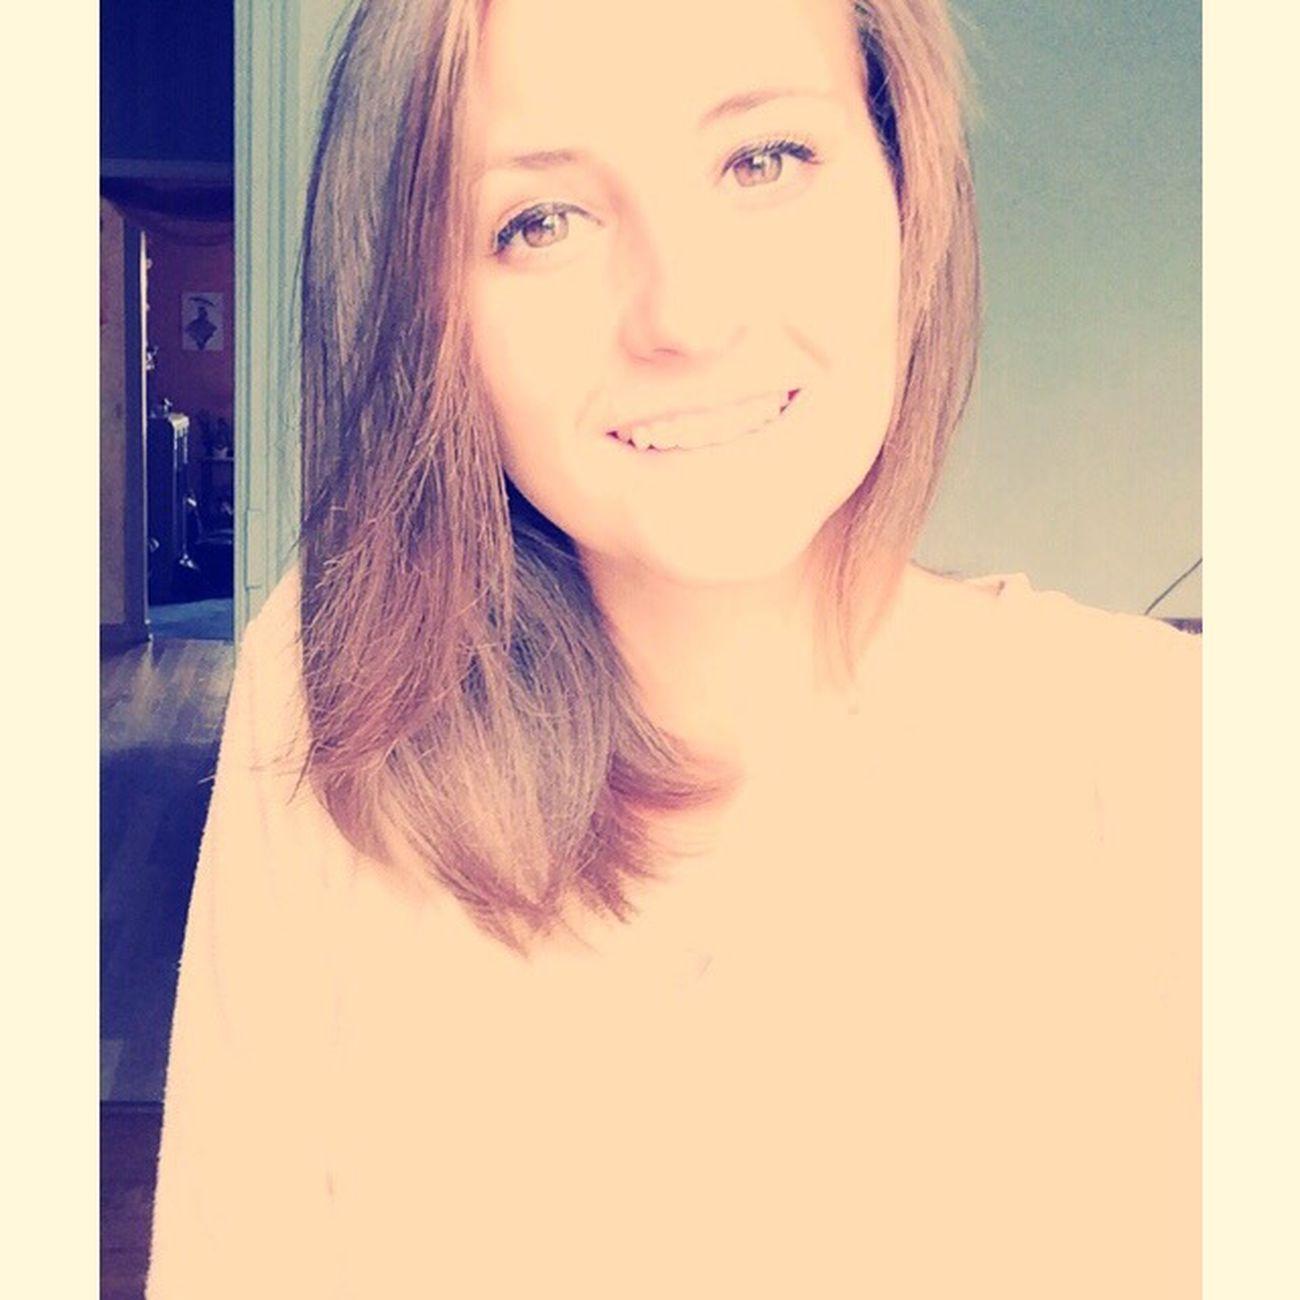 Frenchgirl That's Me Hello World Enjoying Life